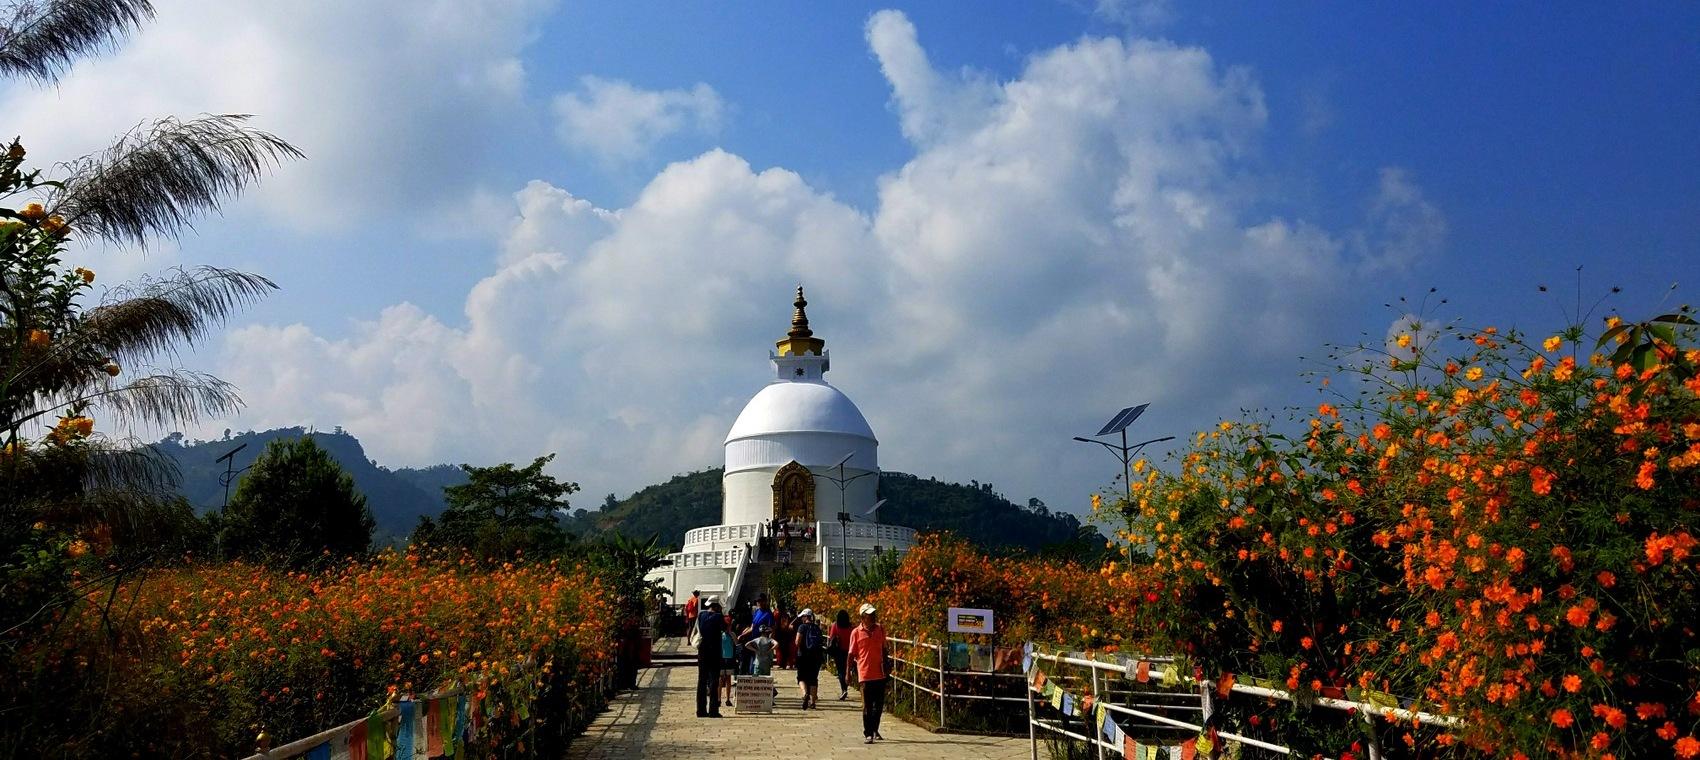 World Peace Pagoda or Stupa and flowers above Pokhara, Nepal